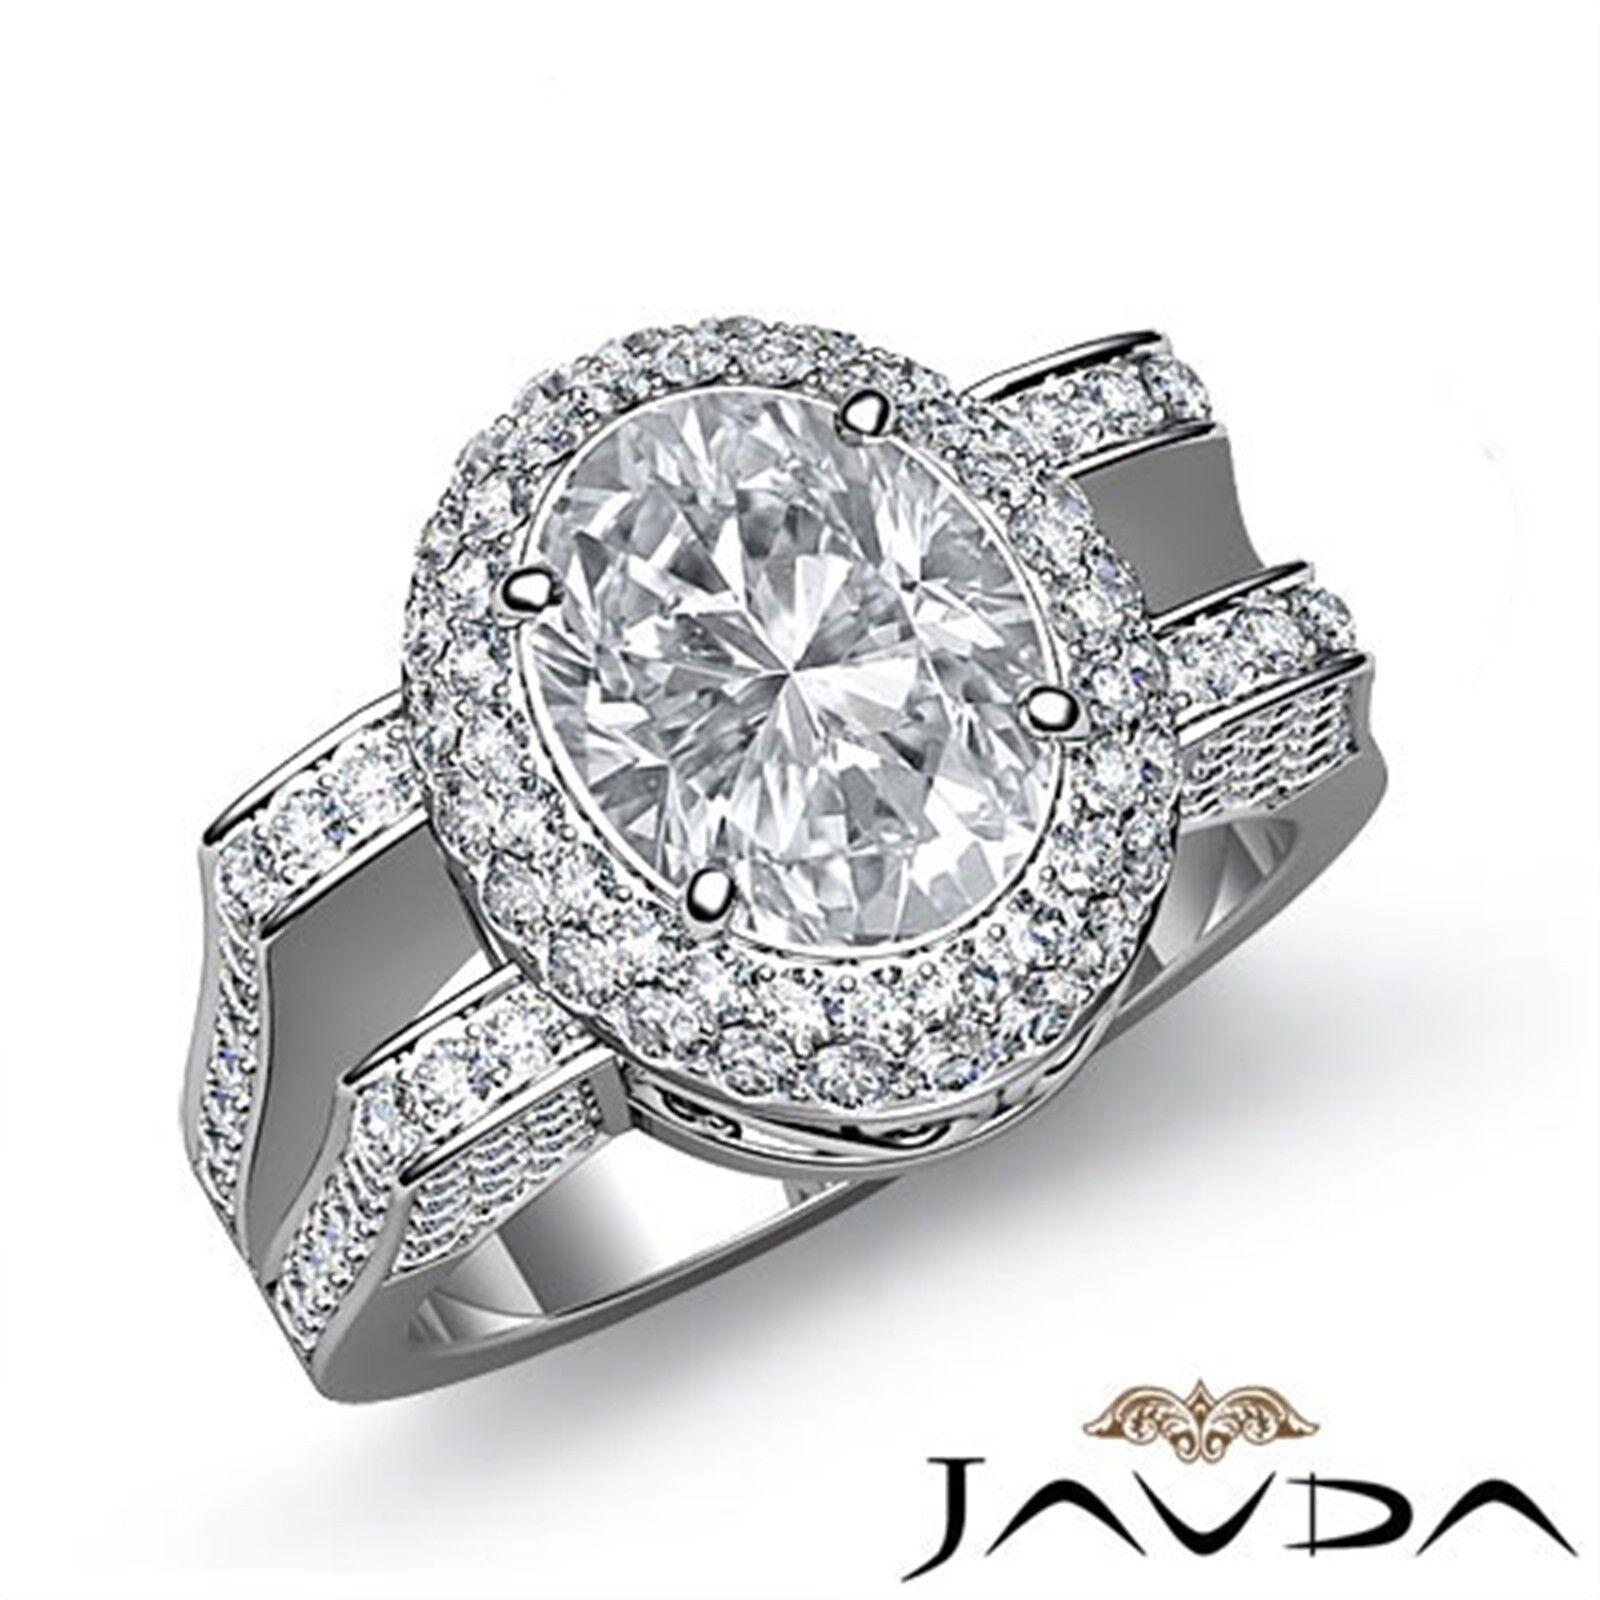 1.9ctw Gala Halo Split Shank Oval Diamond Engagement Ring GIA E-VS2 White Gold